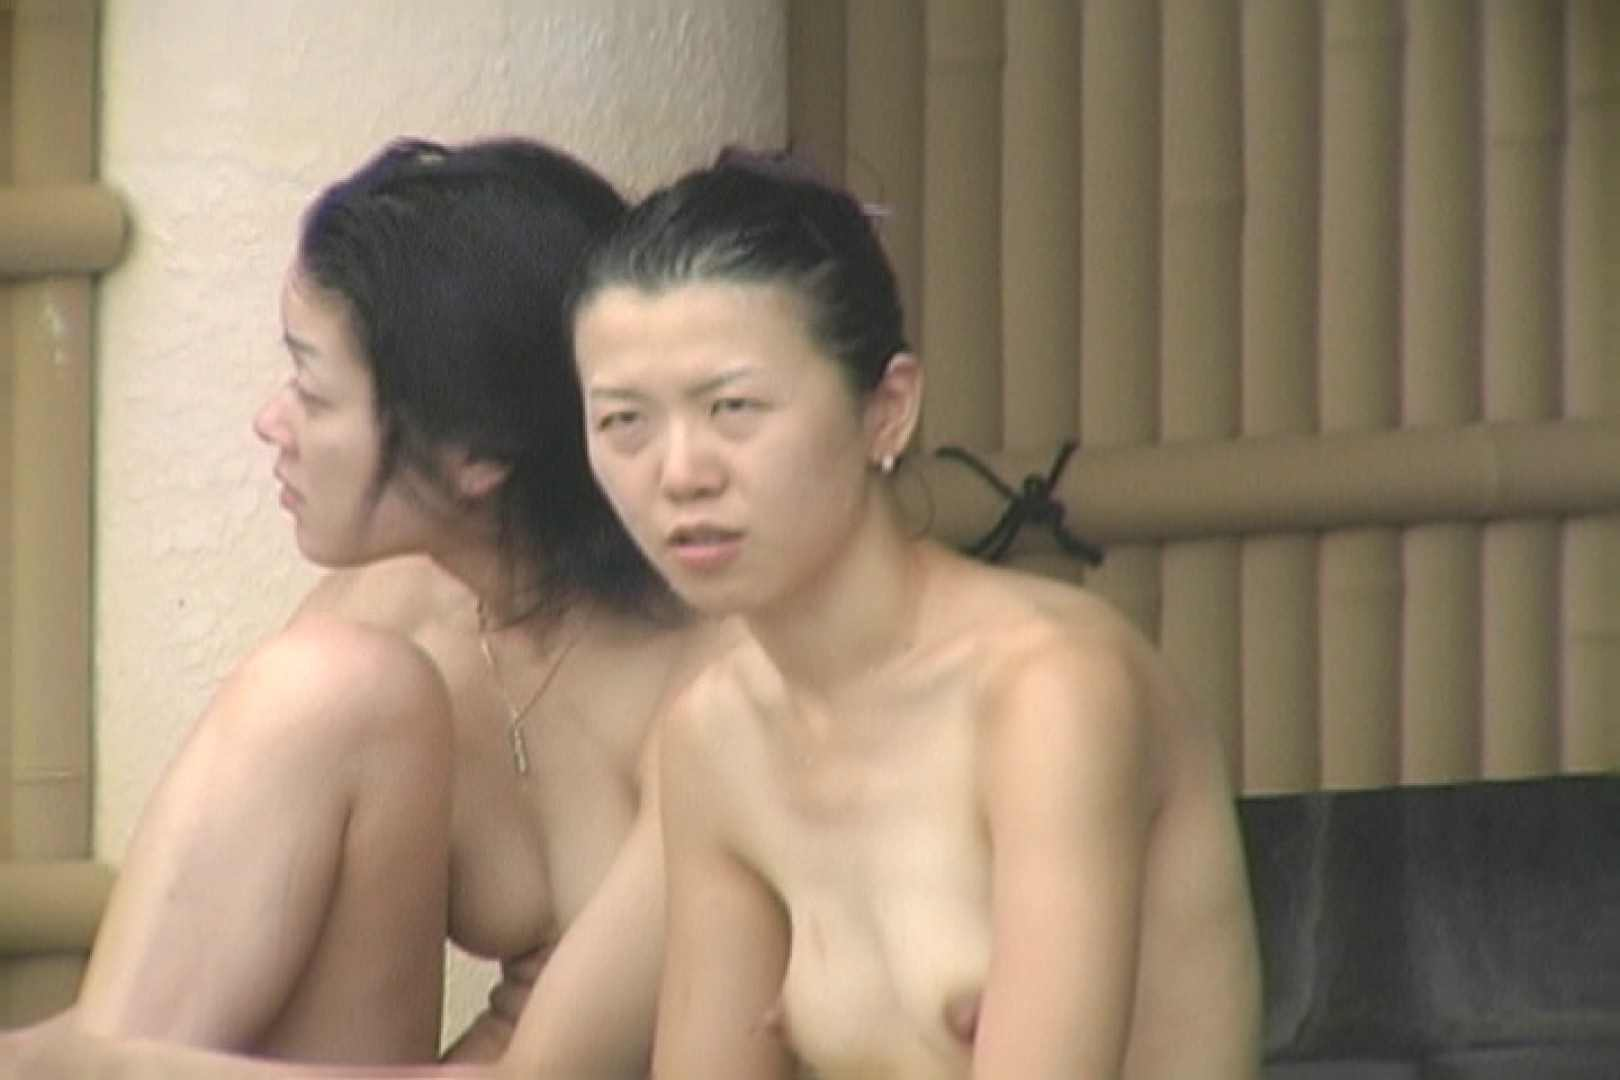 Aquaな露天風呂Vol.638 露天風呂編 | 盗撮シリーズ  87PIX 49